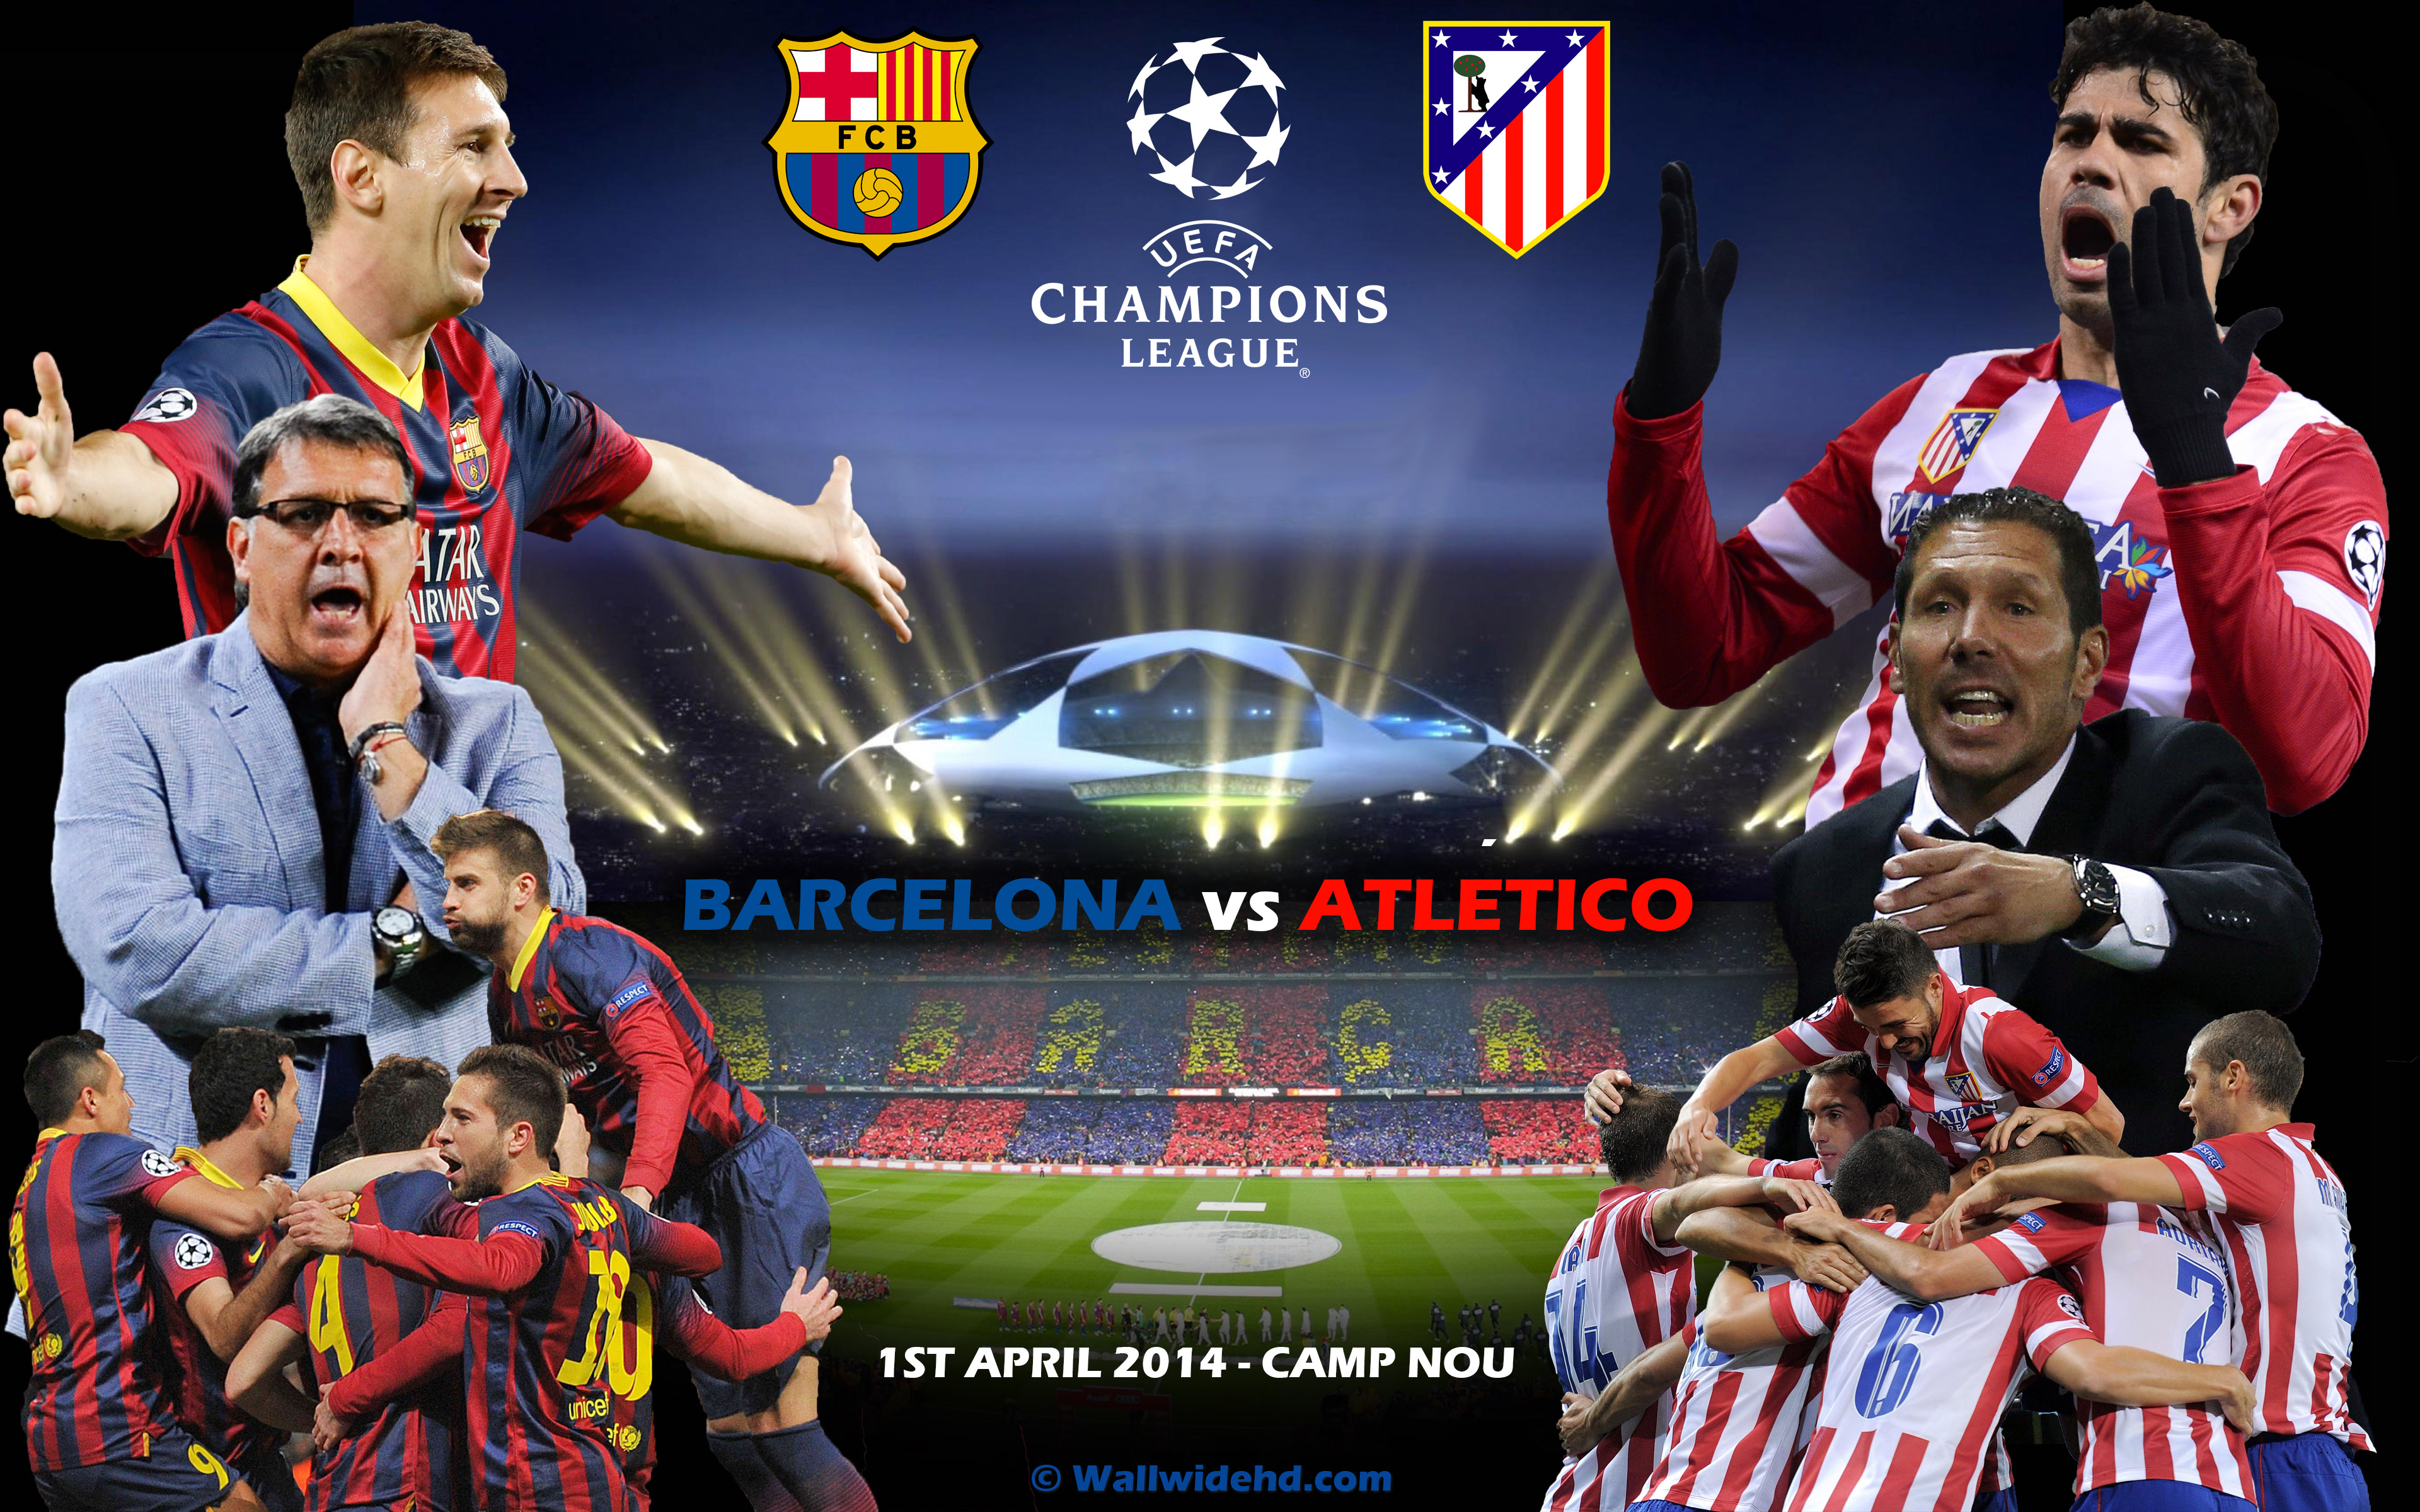 FC Barcelona vs Atletico de Madrid 2014 Champions League Wallpaper 3840x2400